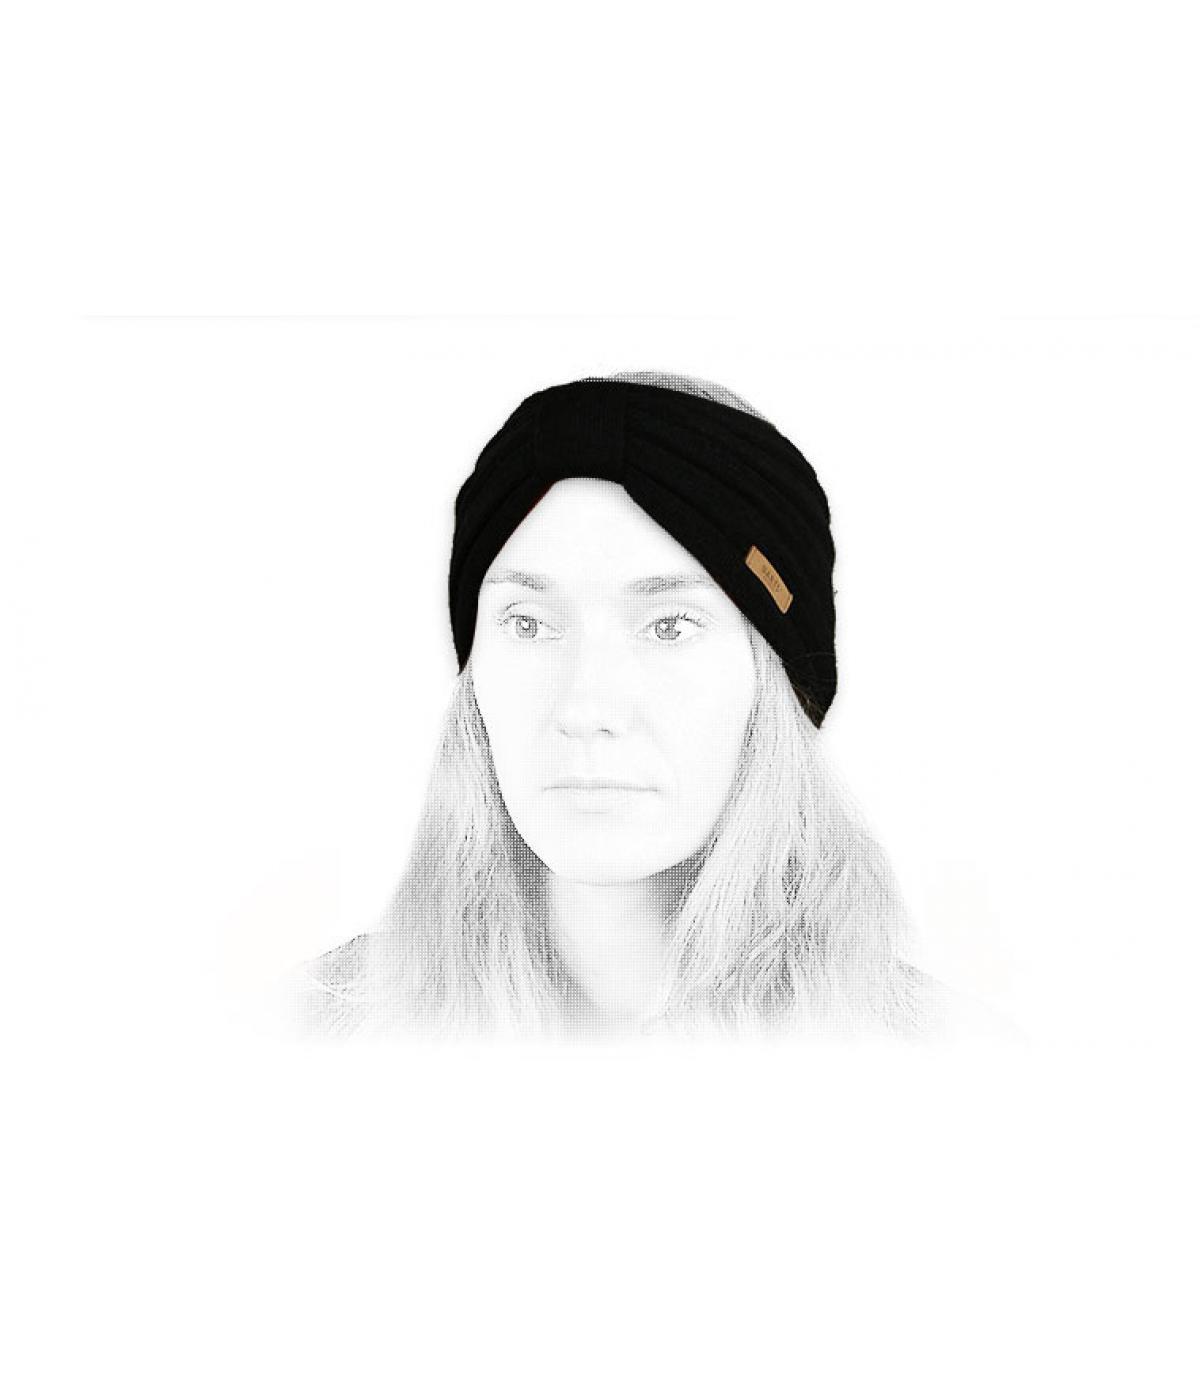 Détails Zitoun Headband black - image 4